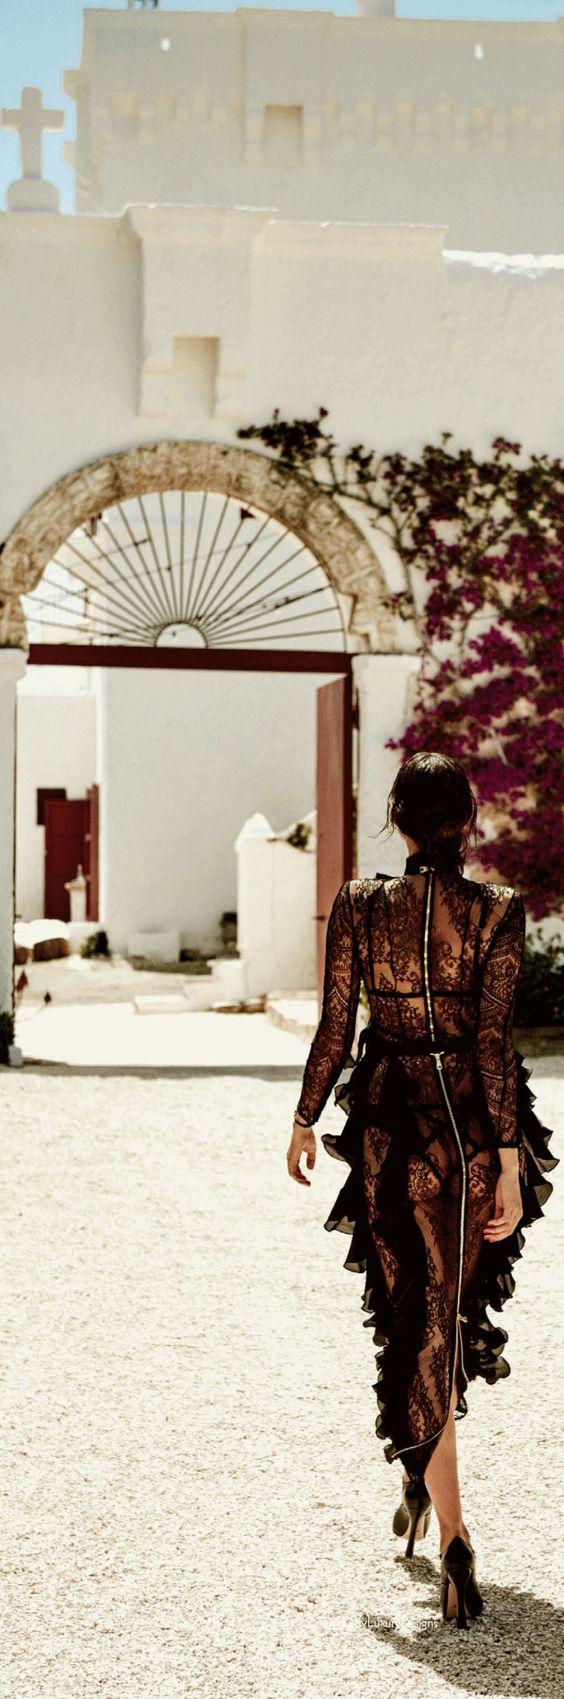 Irina Shayk - Lady Of Spain | LadyLuxury7